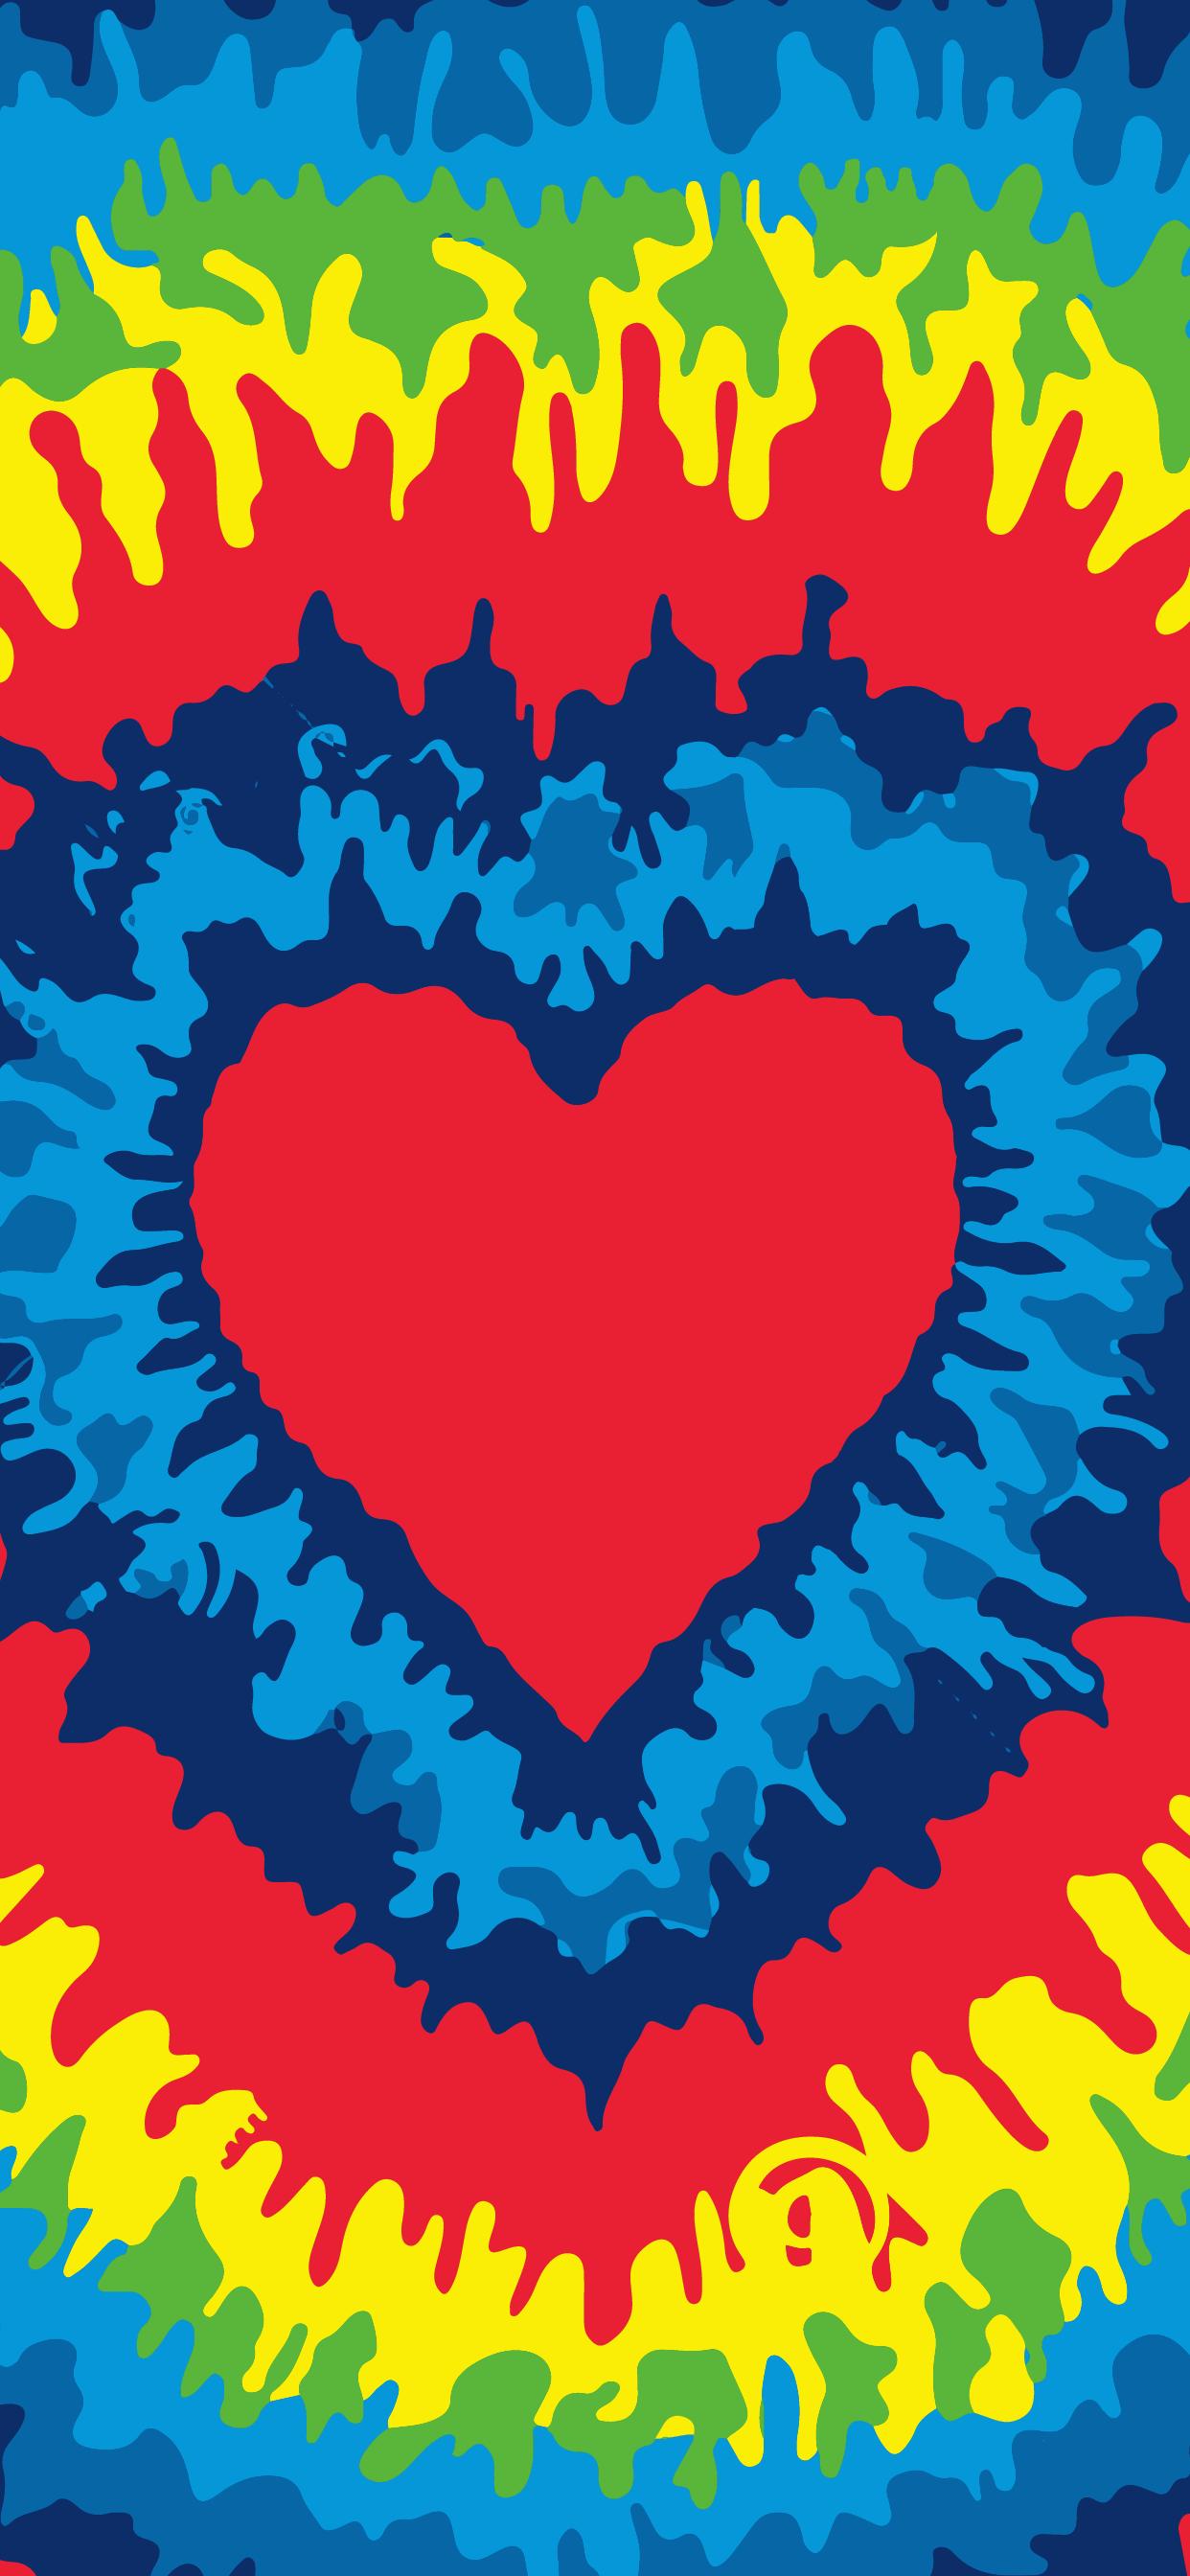 beautiful tie dye heart love wallpaper for mobile phone hd